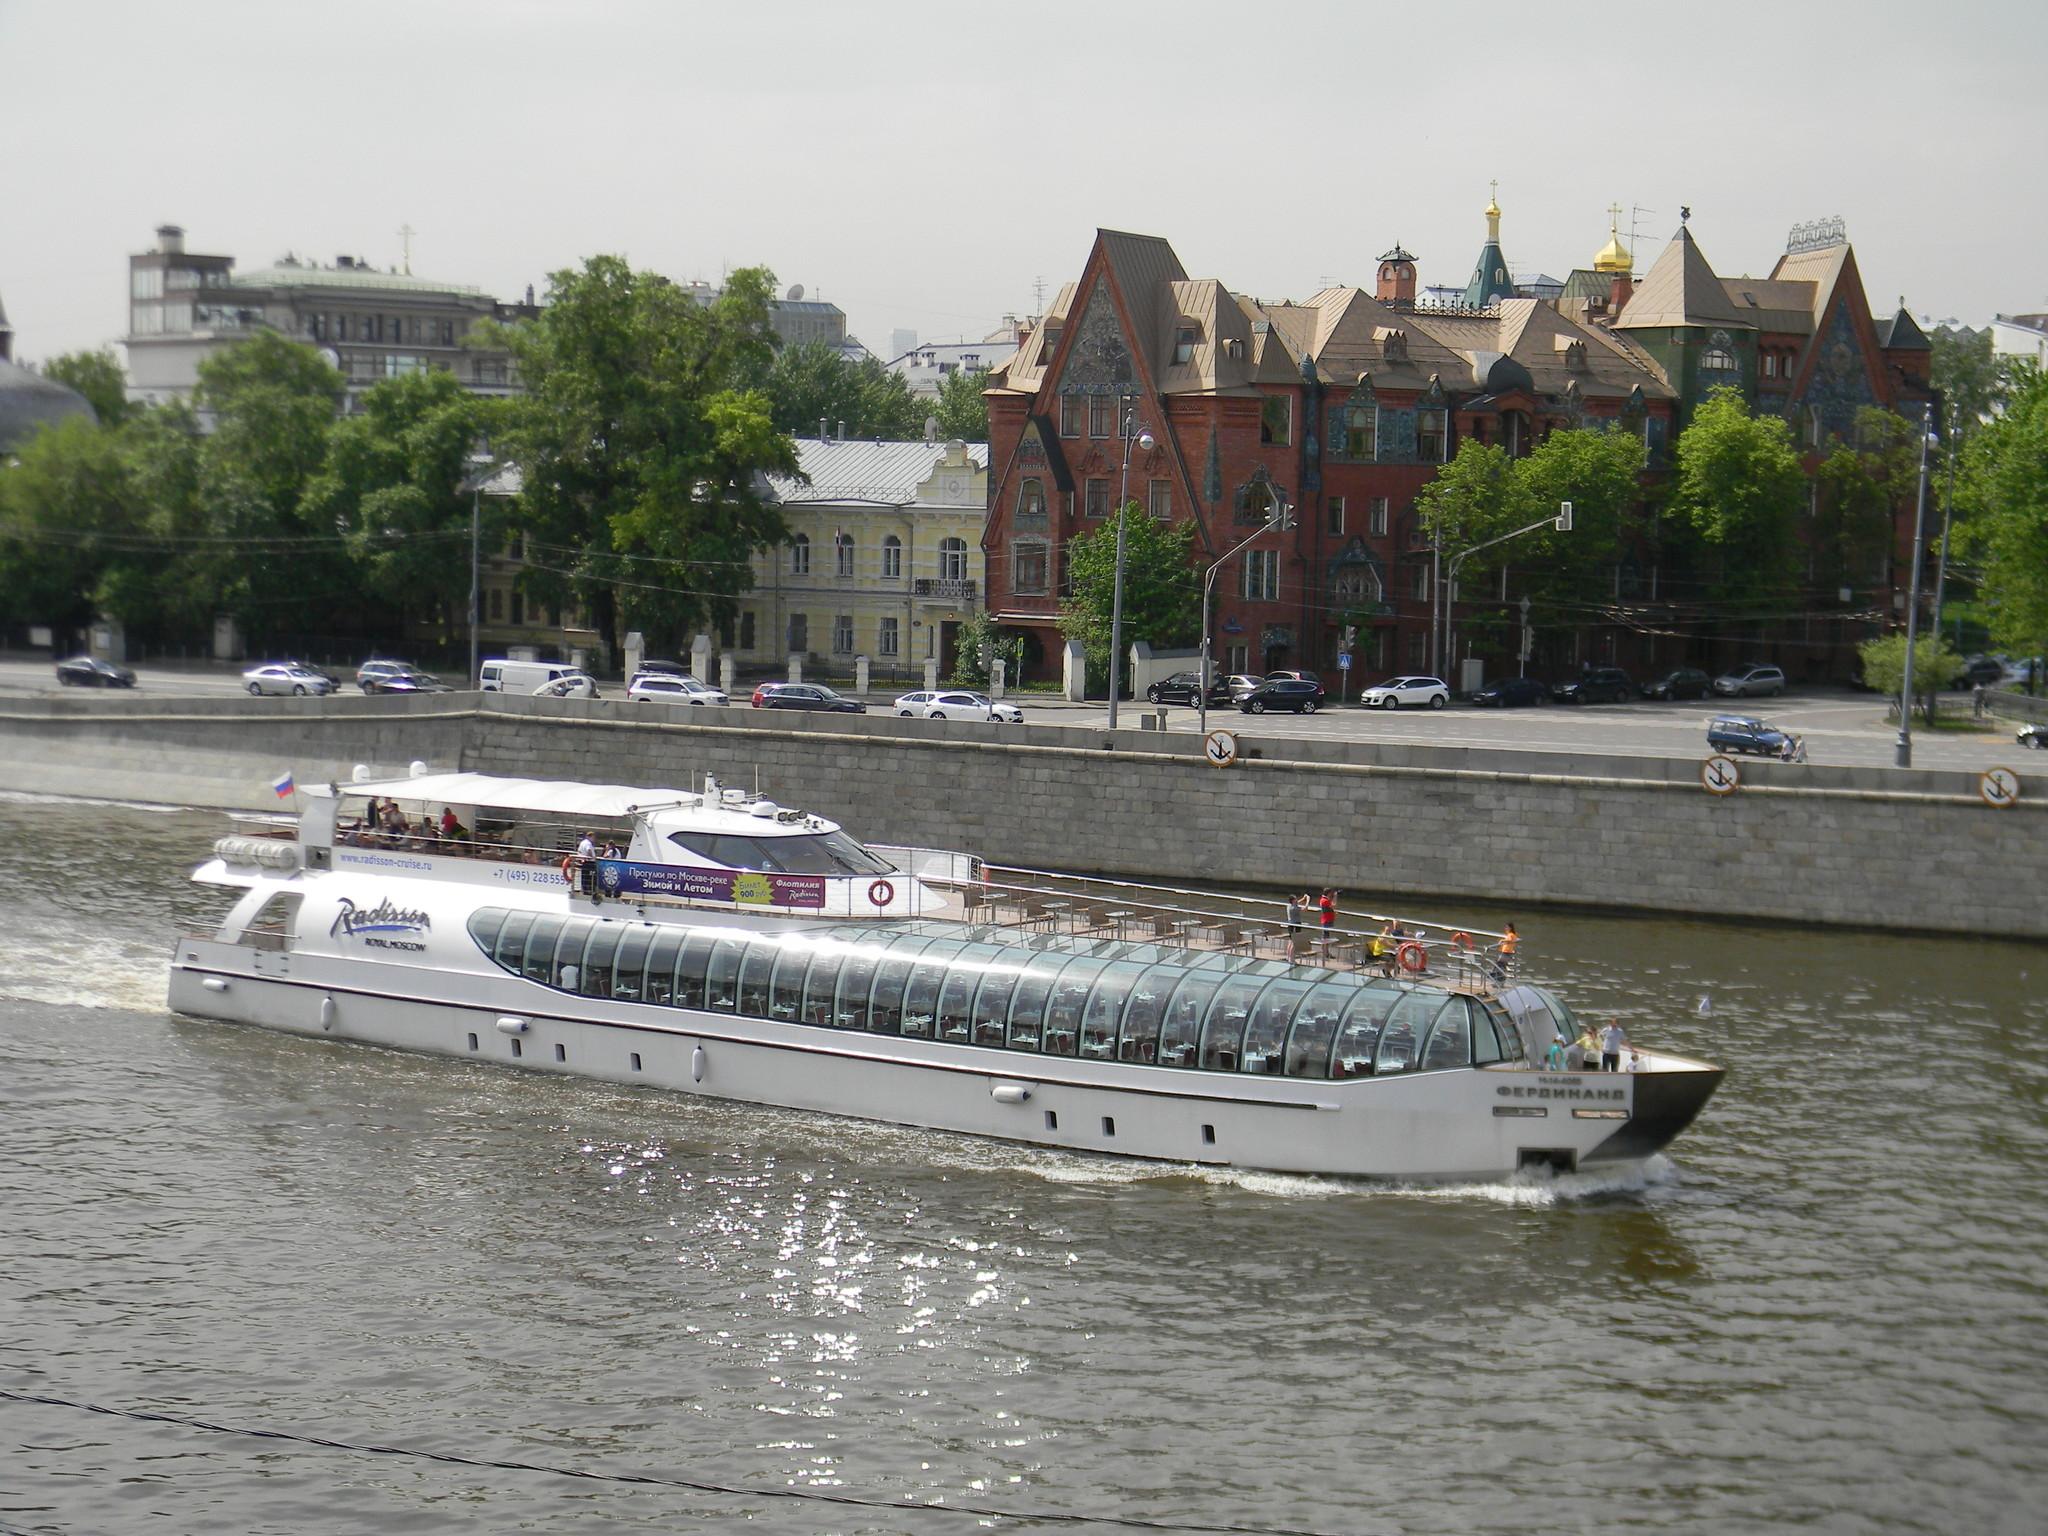 Пассажирский прогулочный теплоход «Фердинанд» компании Radisson Royal